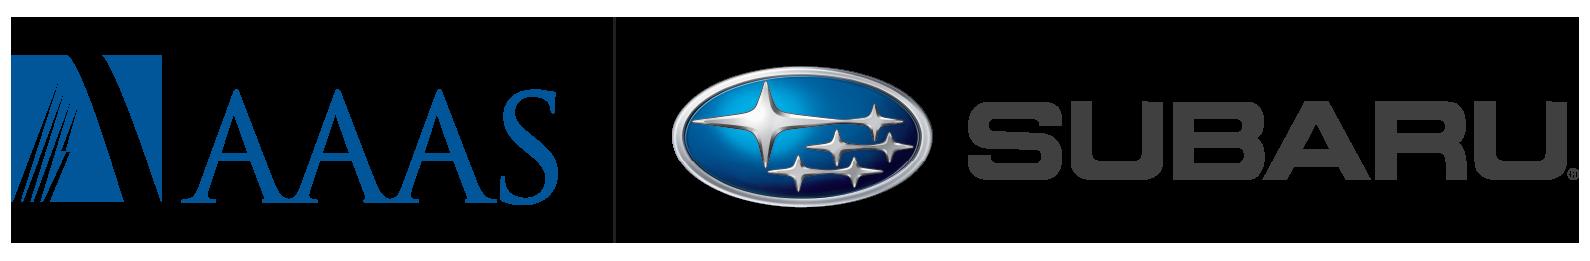 AAAS_Subaru_Logo[RGB].png